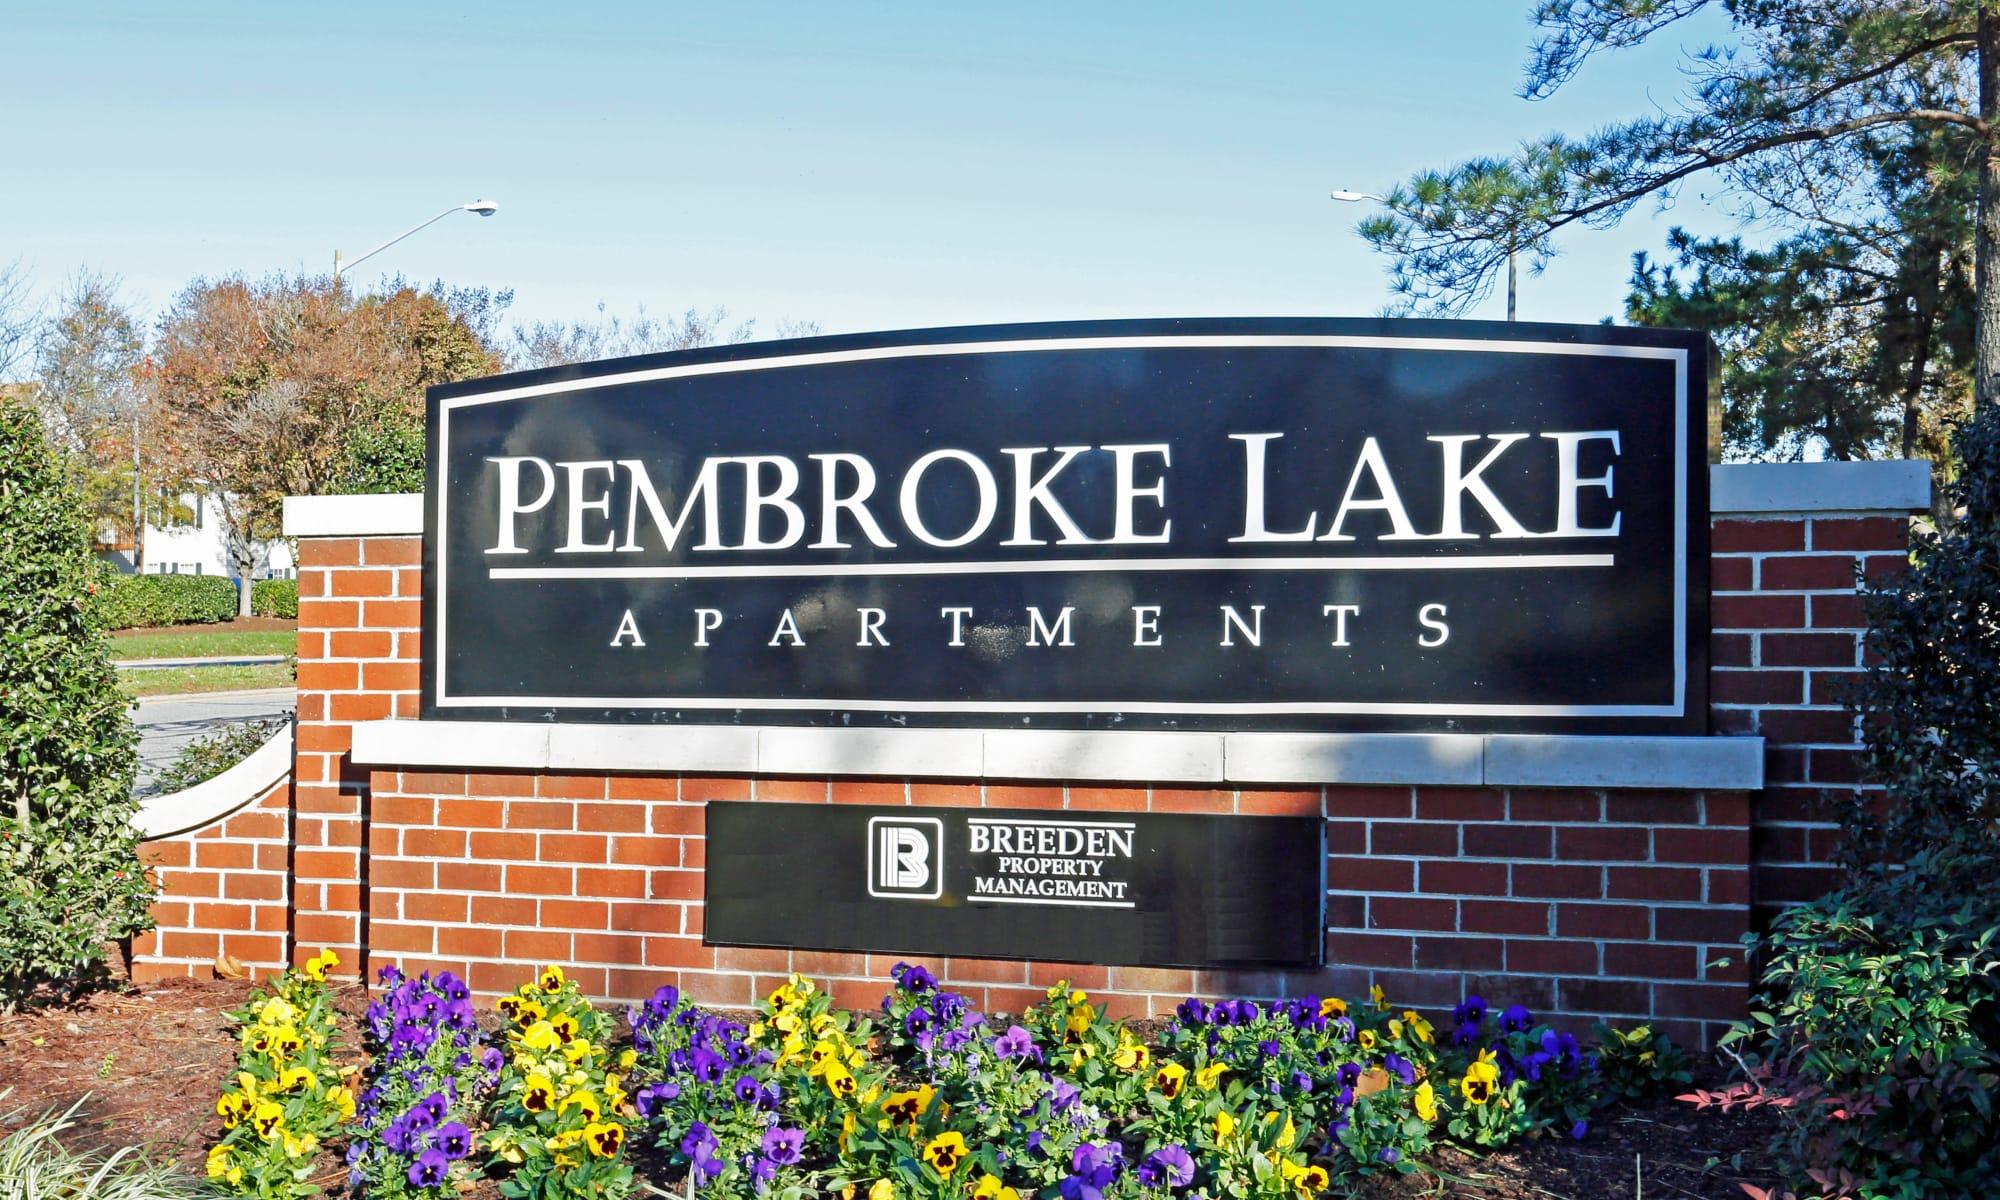 Pembroke Lake Apartments in Virginia Beach, Virginia